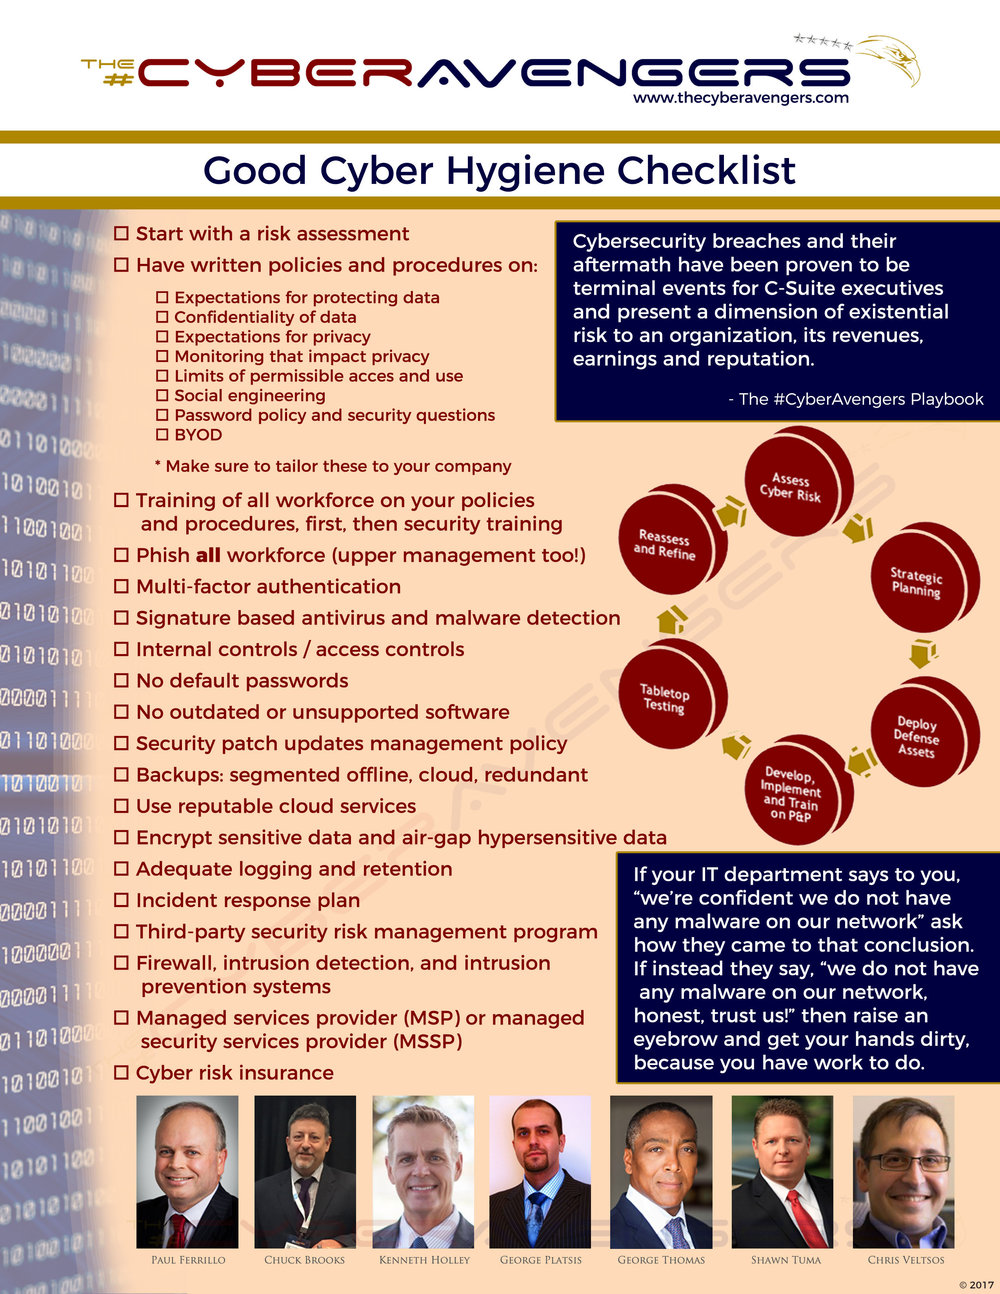 The-CyberAvengers-Good-Cyber-Hygiene-Checklist.jpg